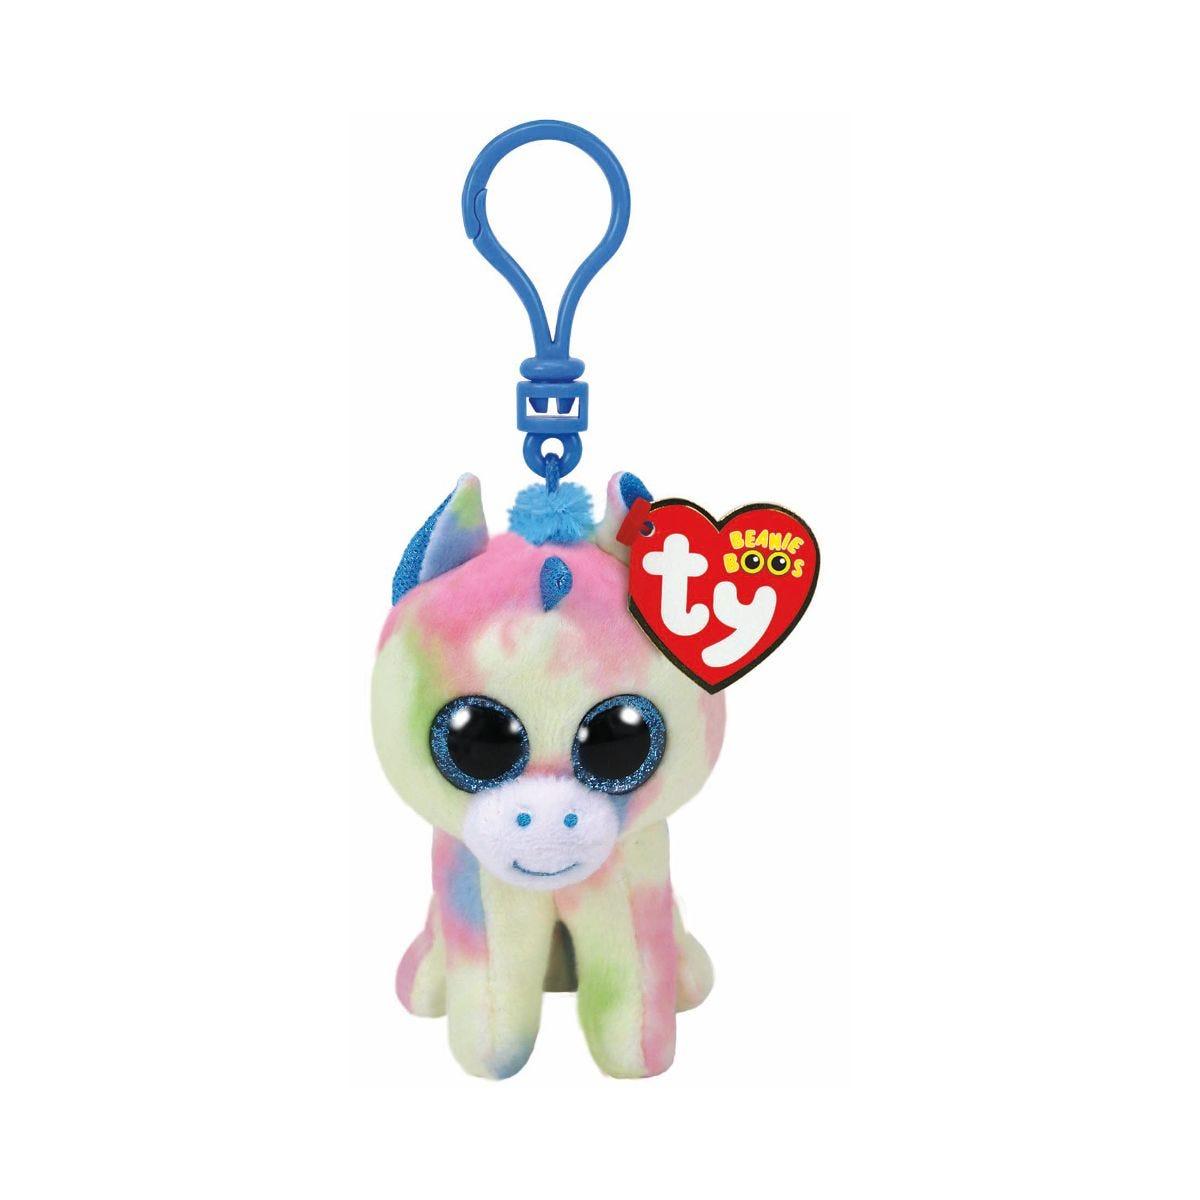 Image of Ty Blitz Beanie Boo Unicorn Clip Keyring